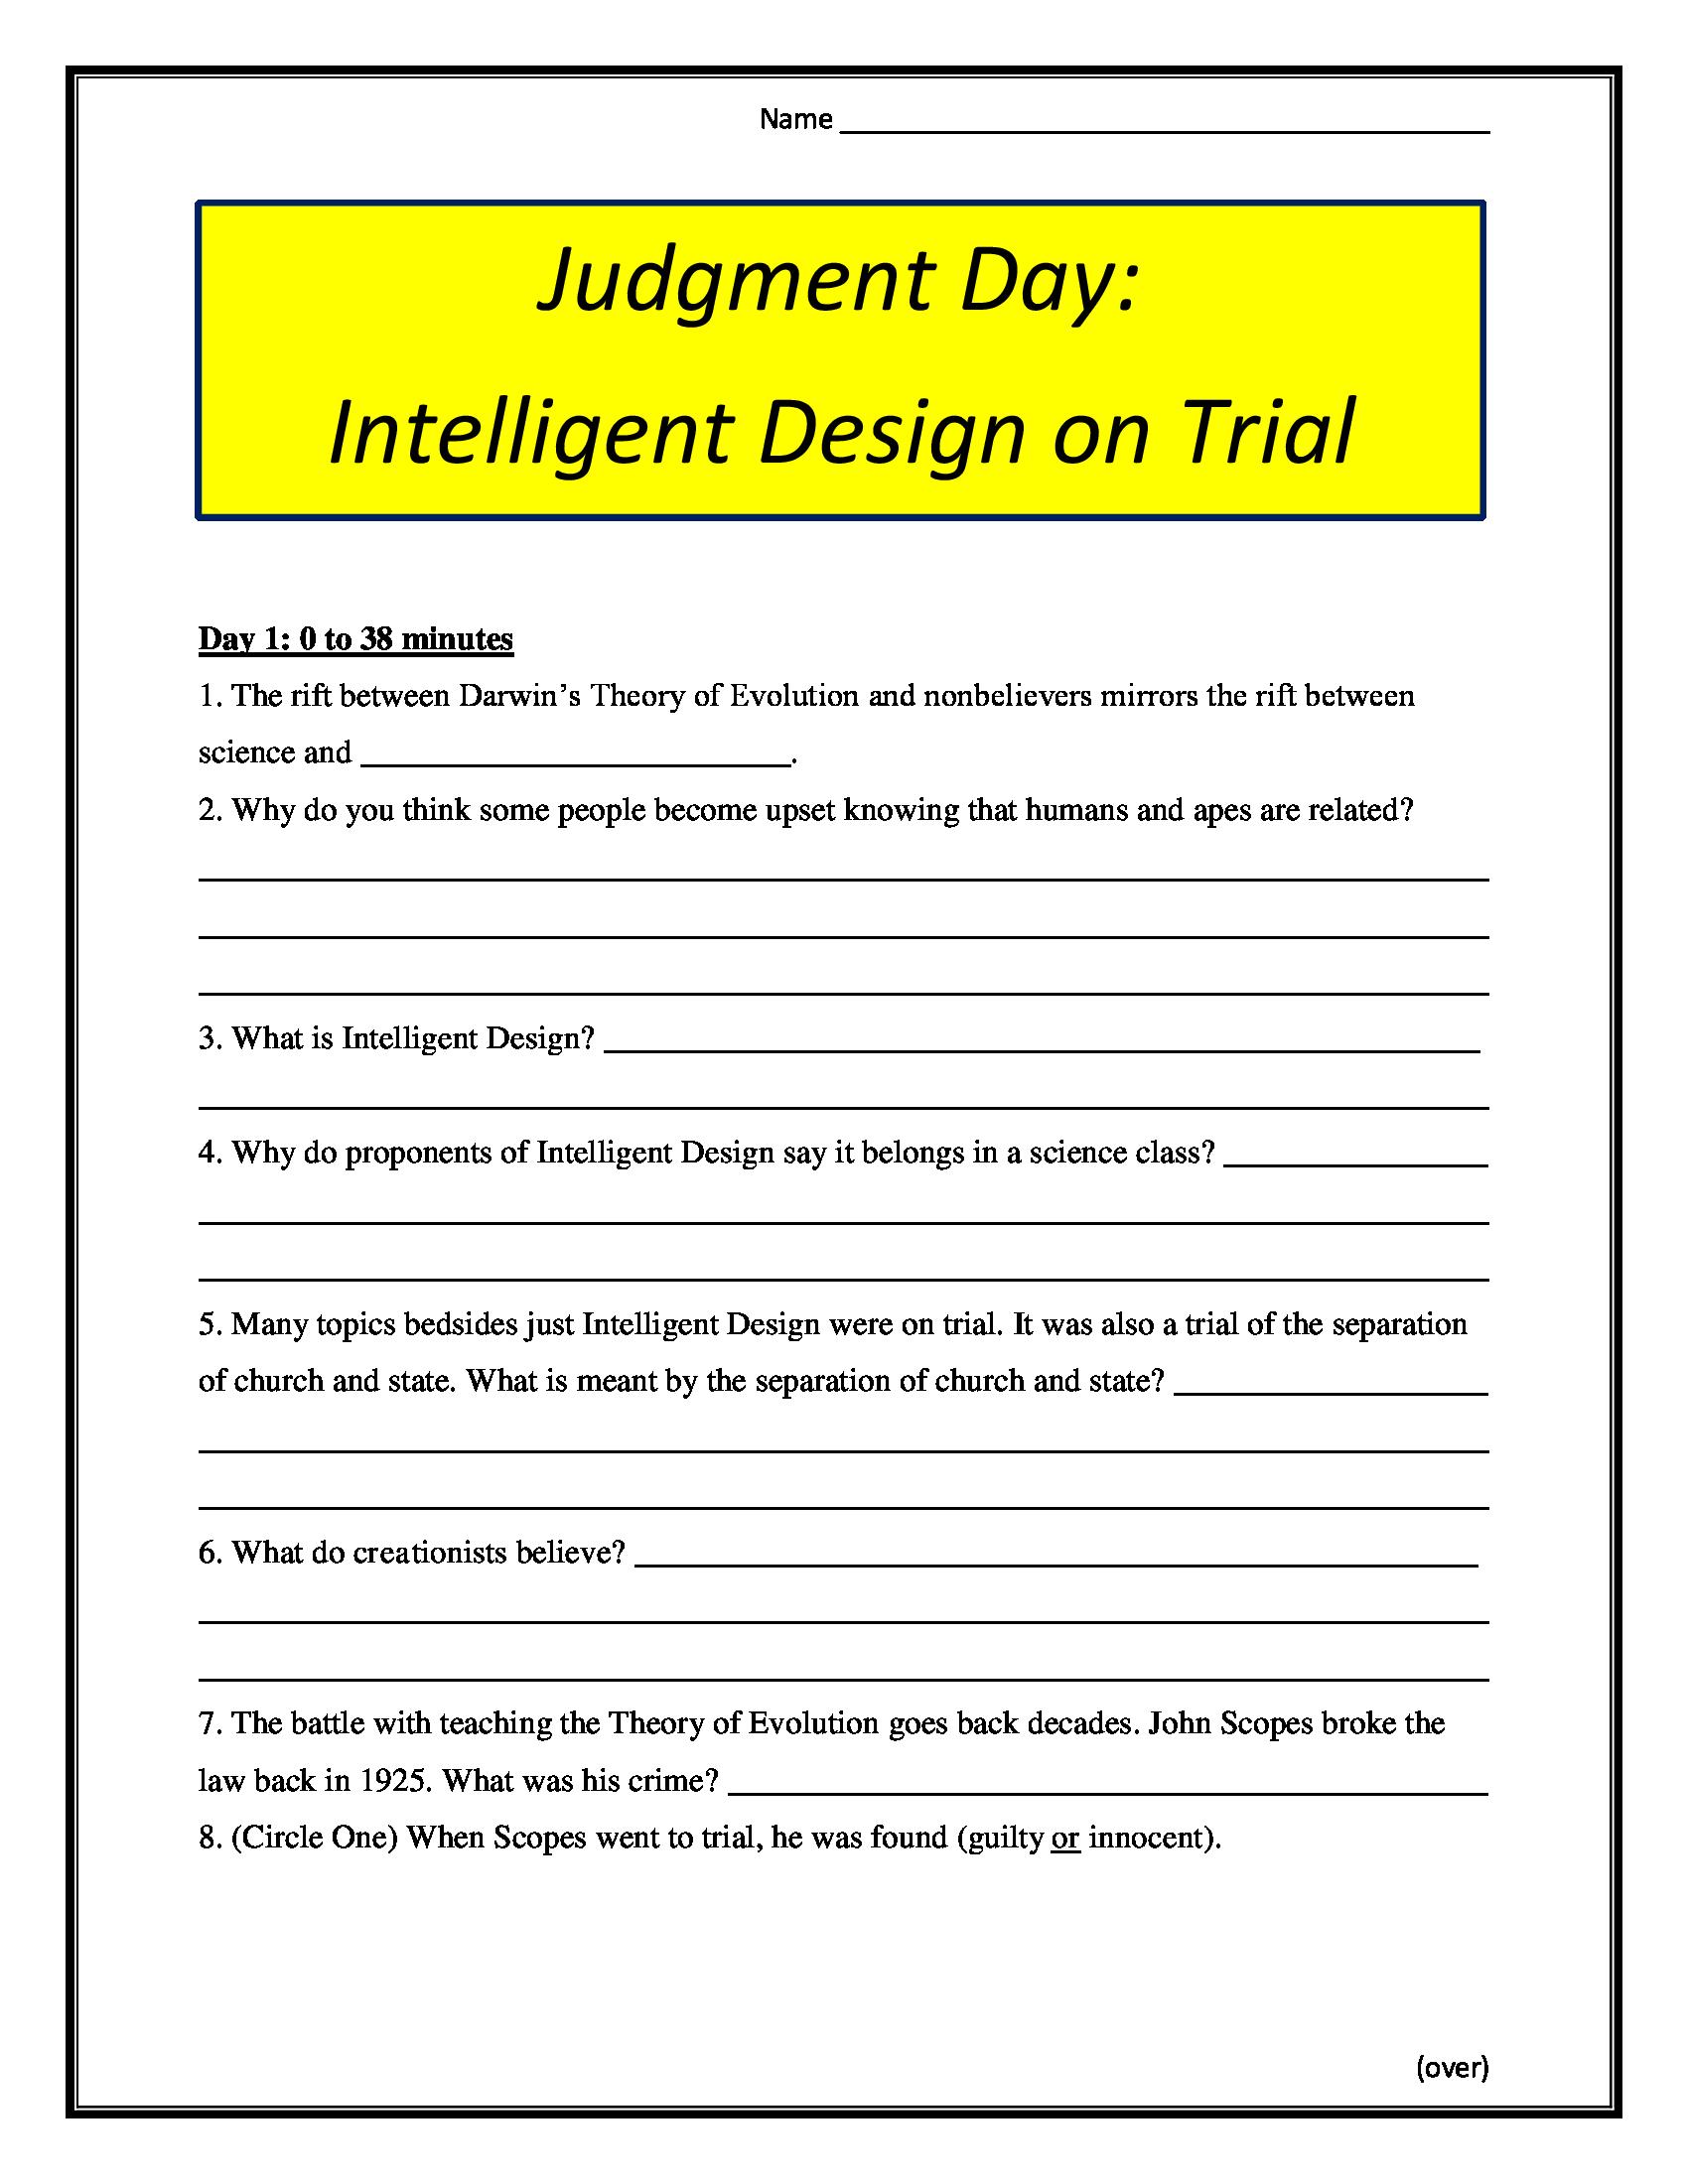 Judgment Day Intelligent Design On Trial Worksheet